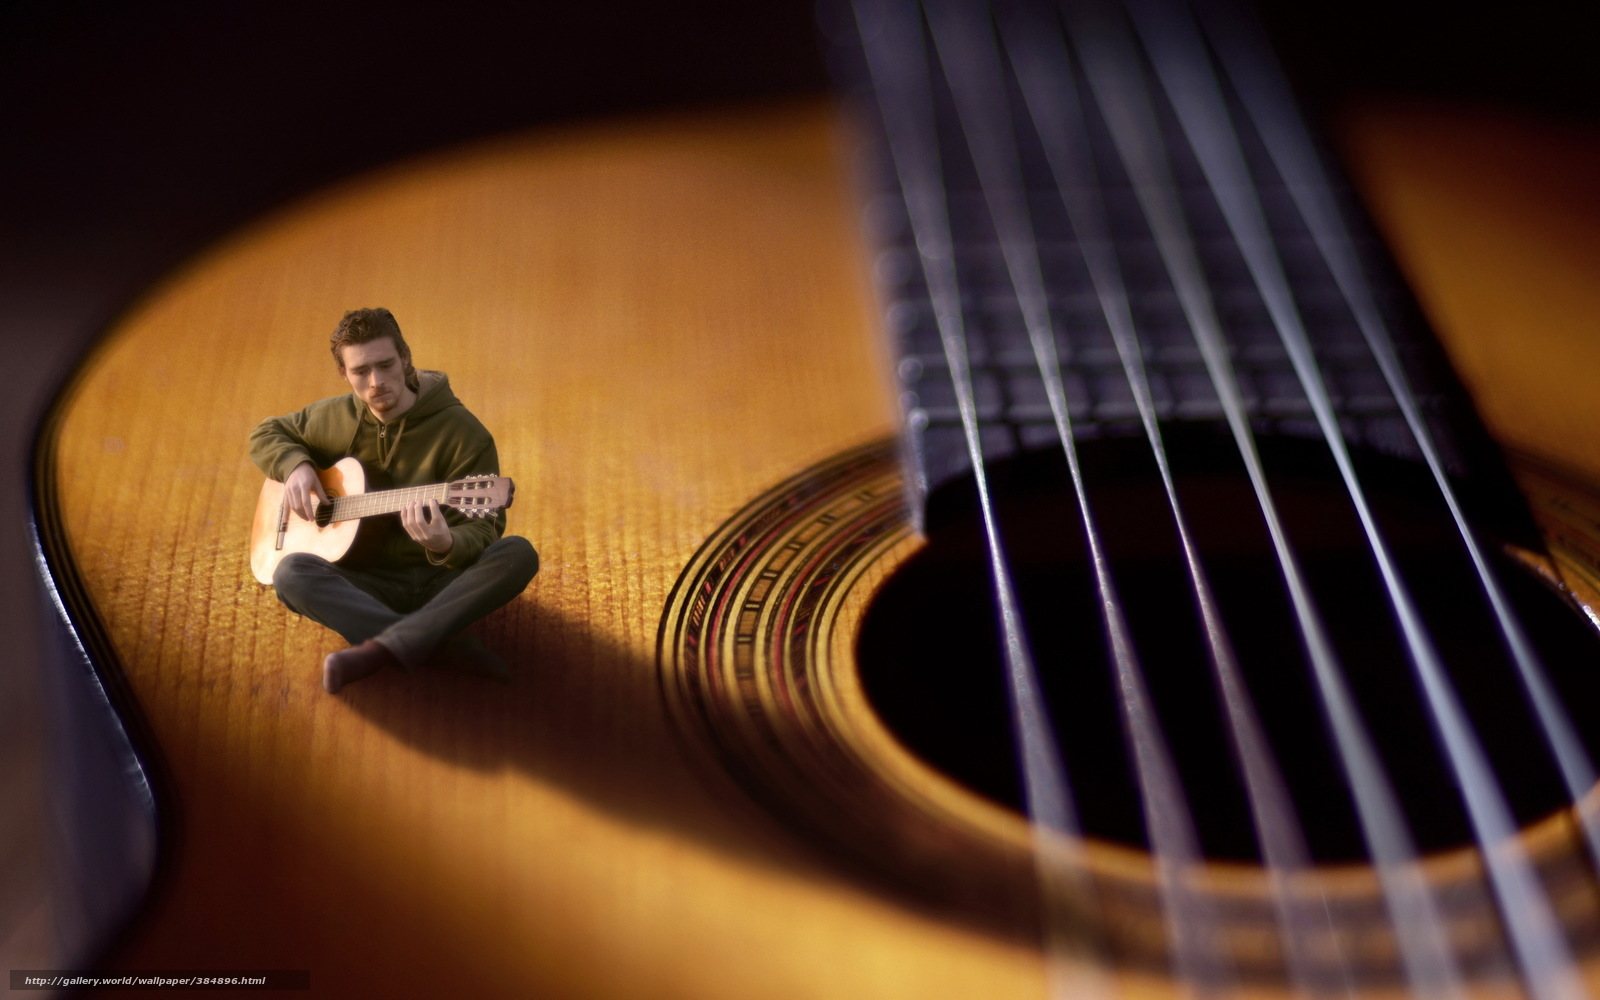 Tlcharger fond decran musicien guitare musique fonds decran